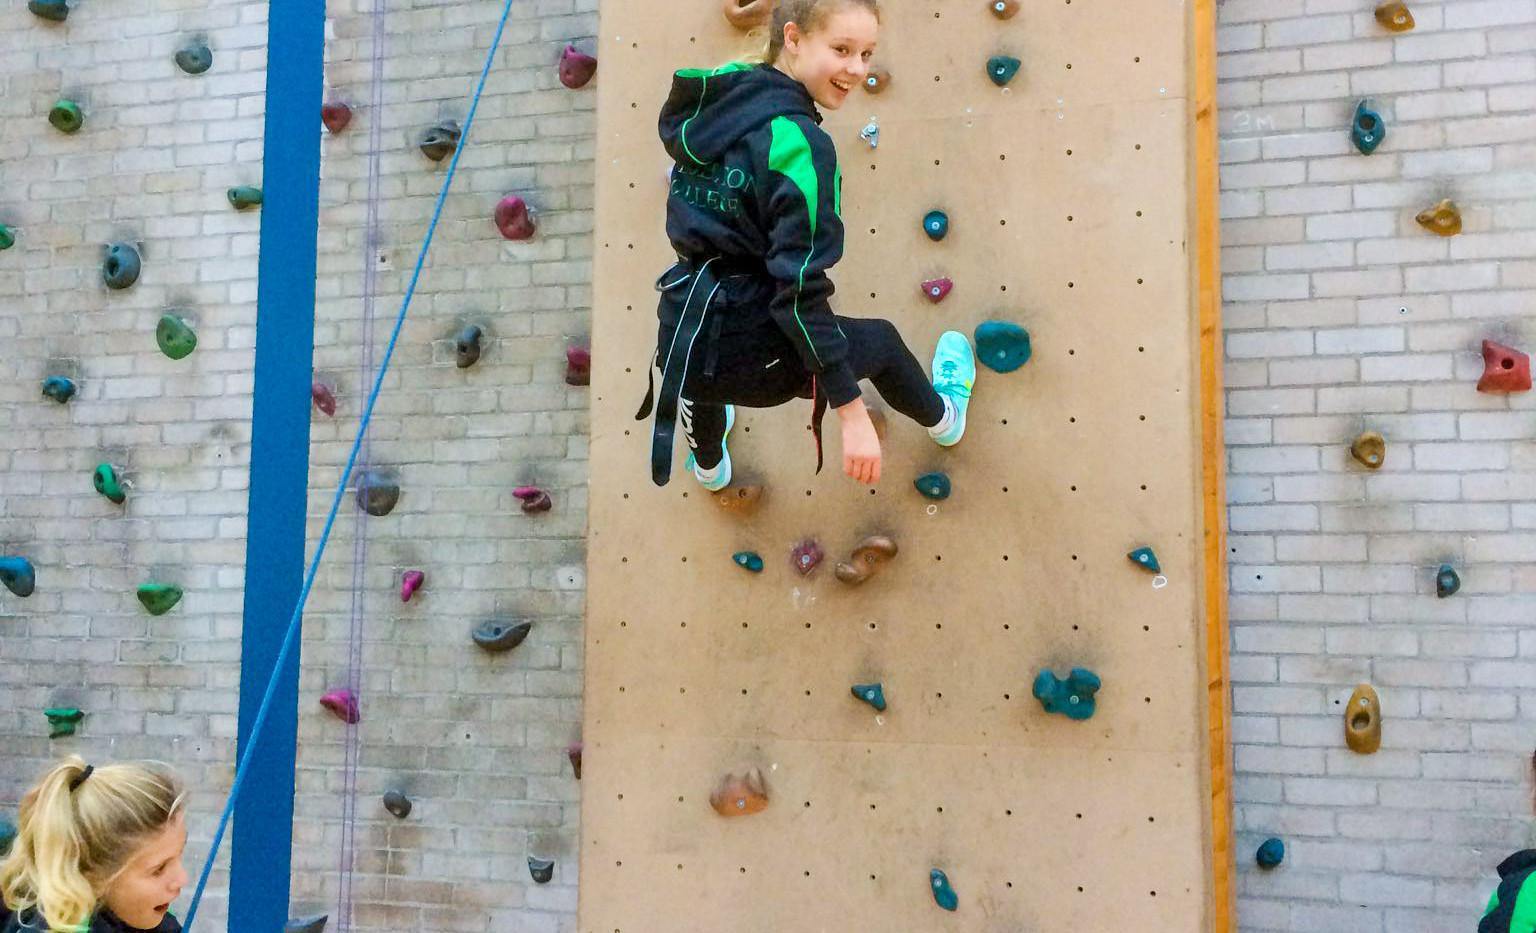 Yr-9-Climbing-and-Belaying-5.jpg